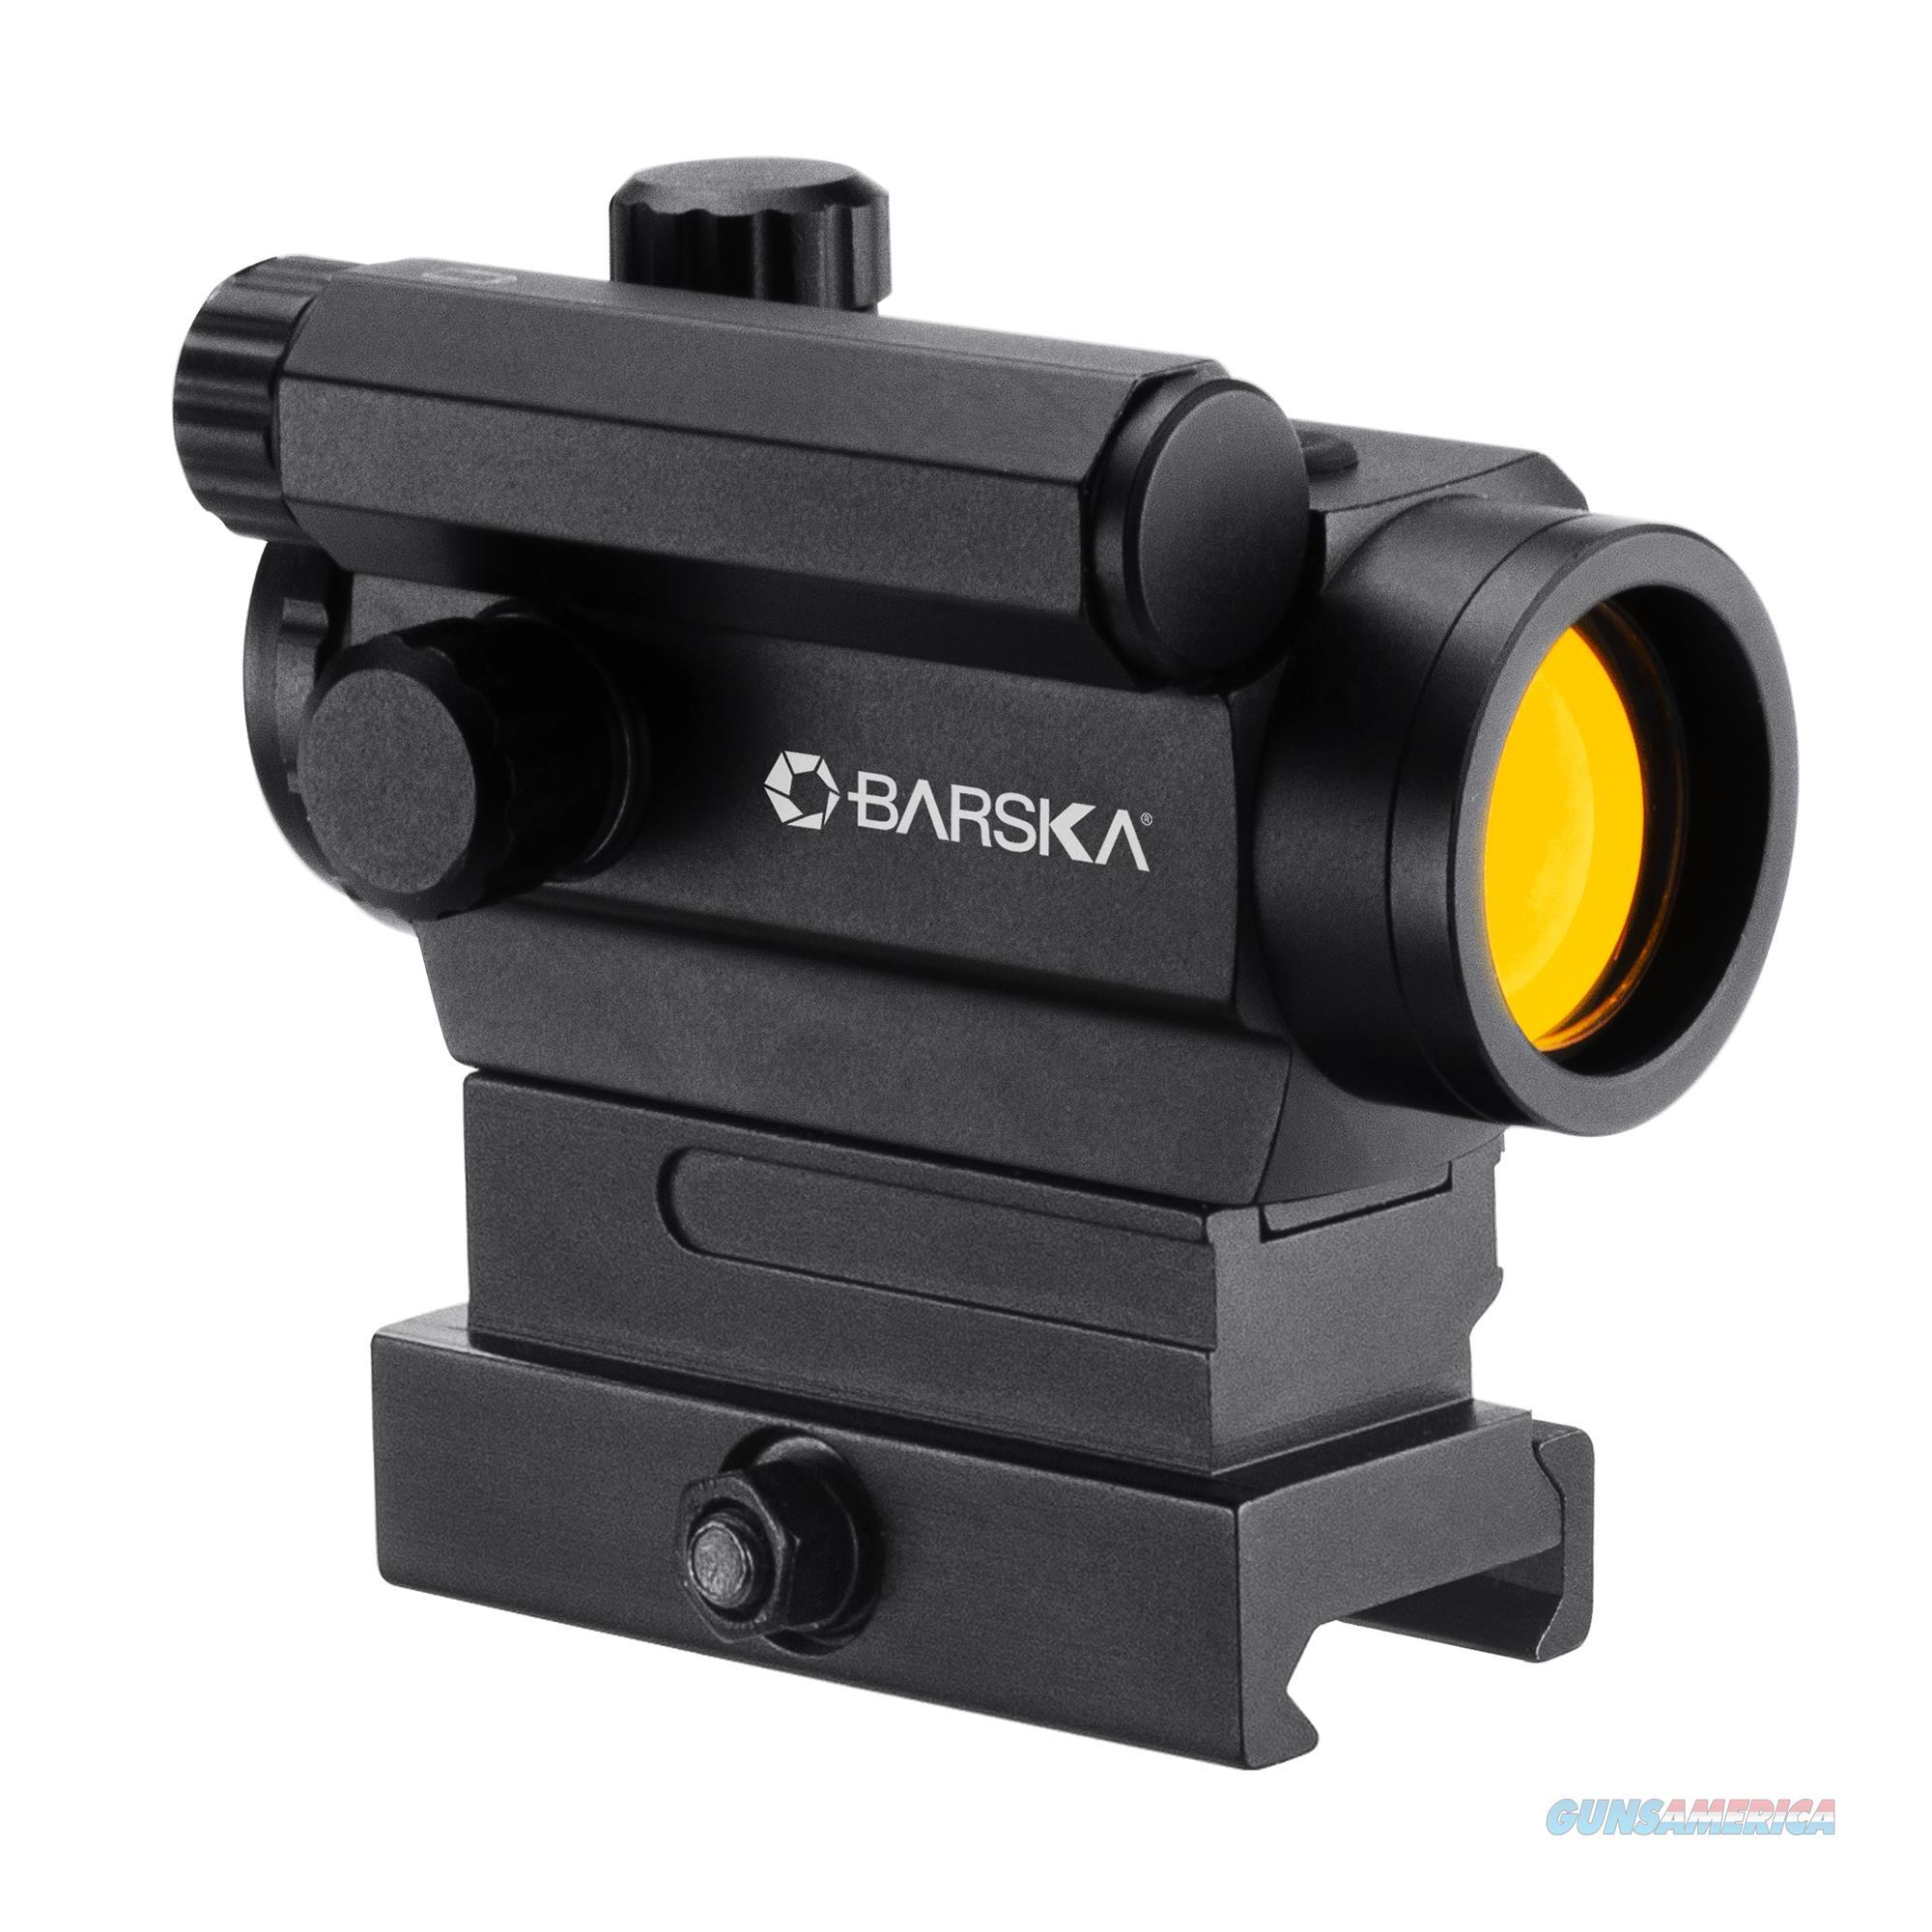 Barska Optics Hq Red Dot AC13158  Non-Guns > Iron/Metal/Peep Sights